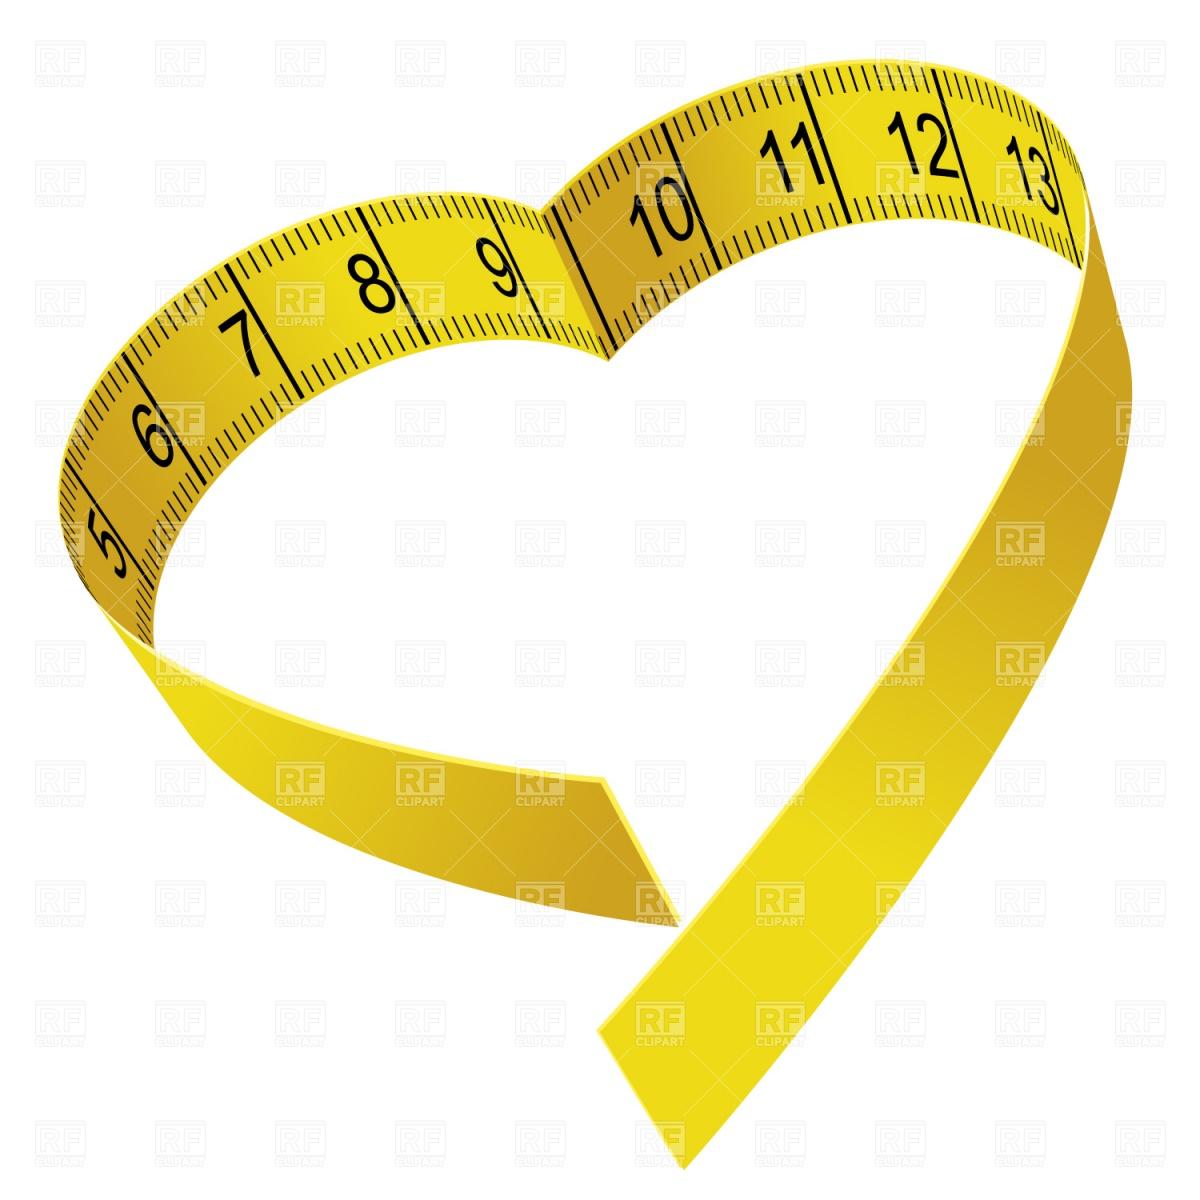 Body Tape Measure Clipart.